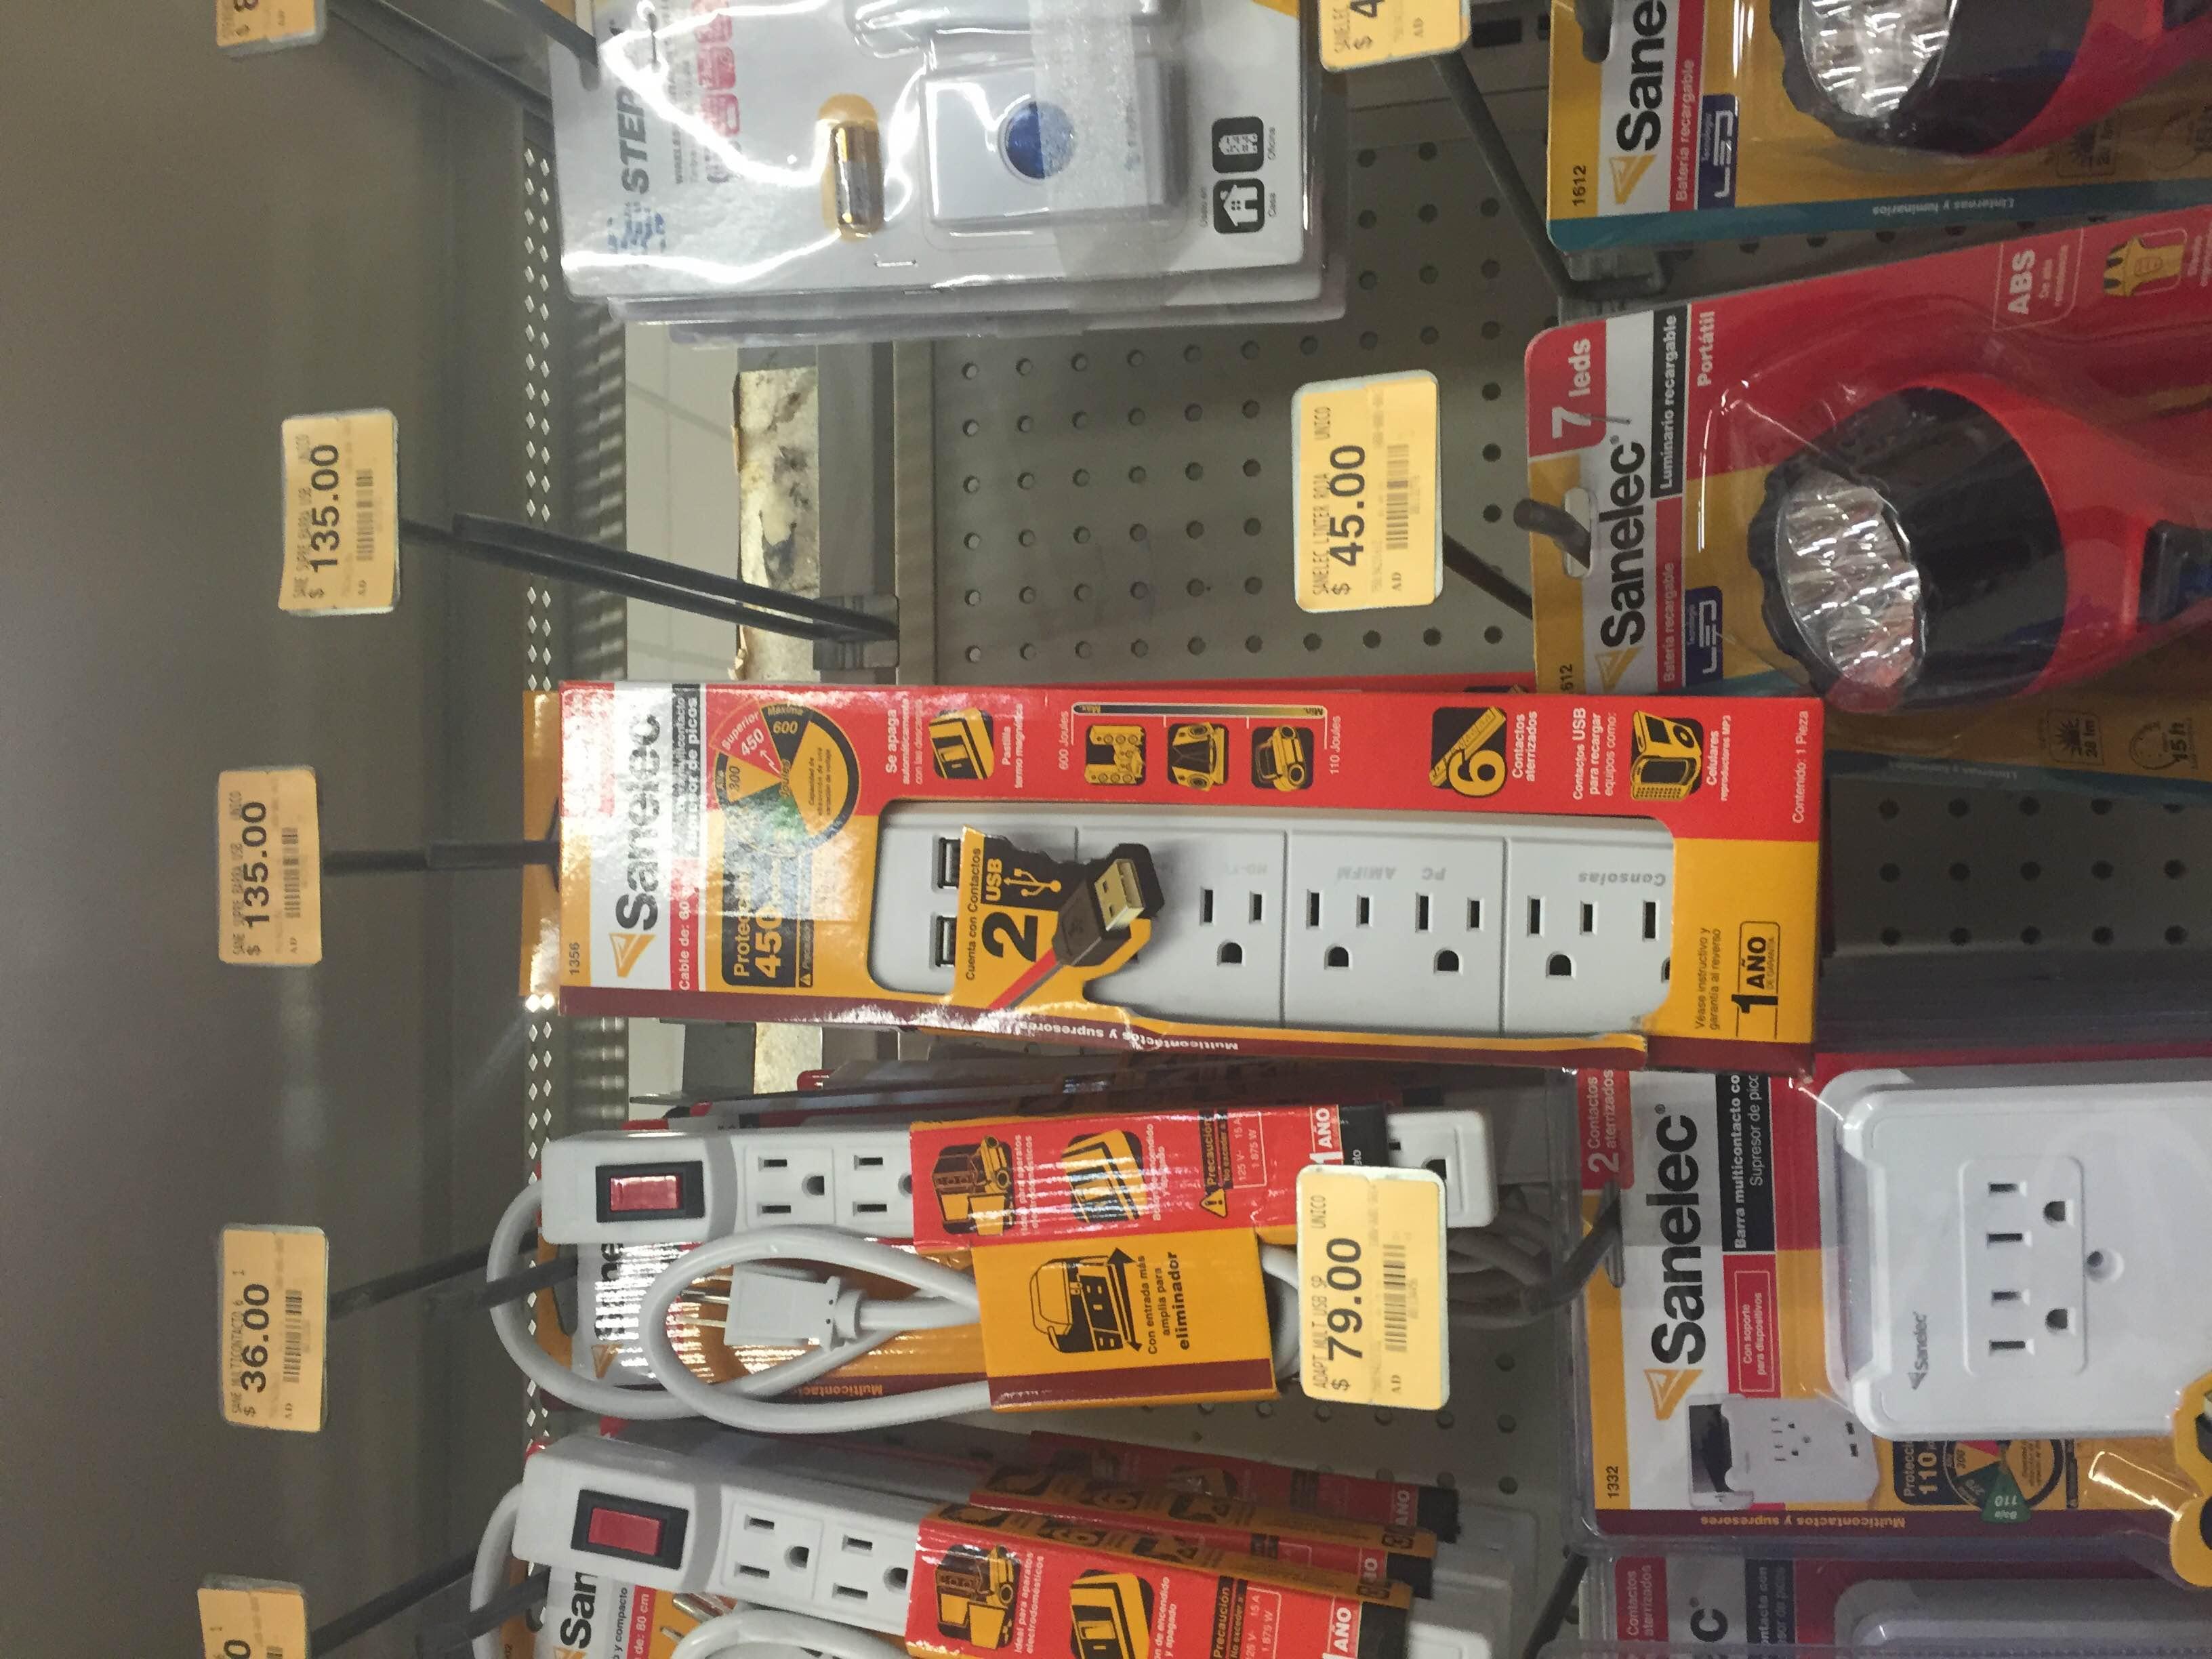 Superama: Multicontacto con 2 puertos de carga USB a $135